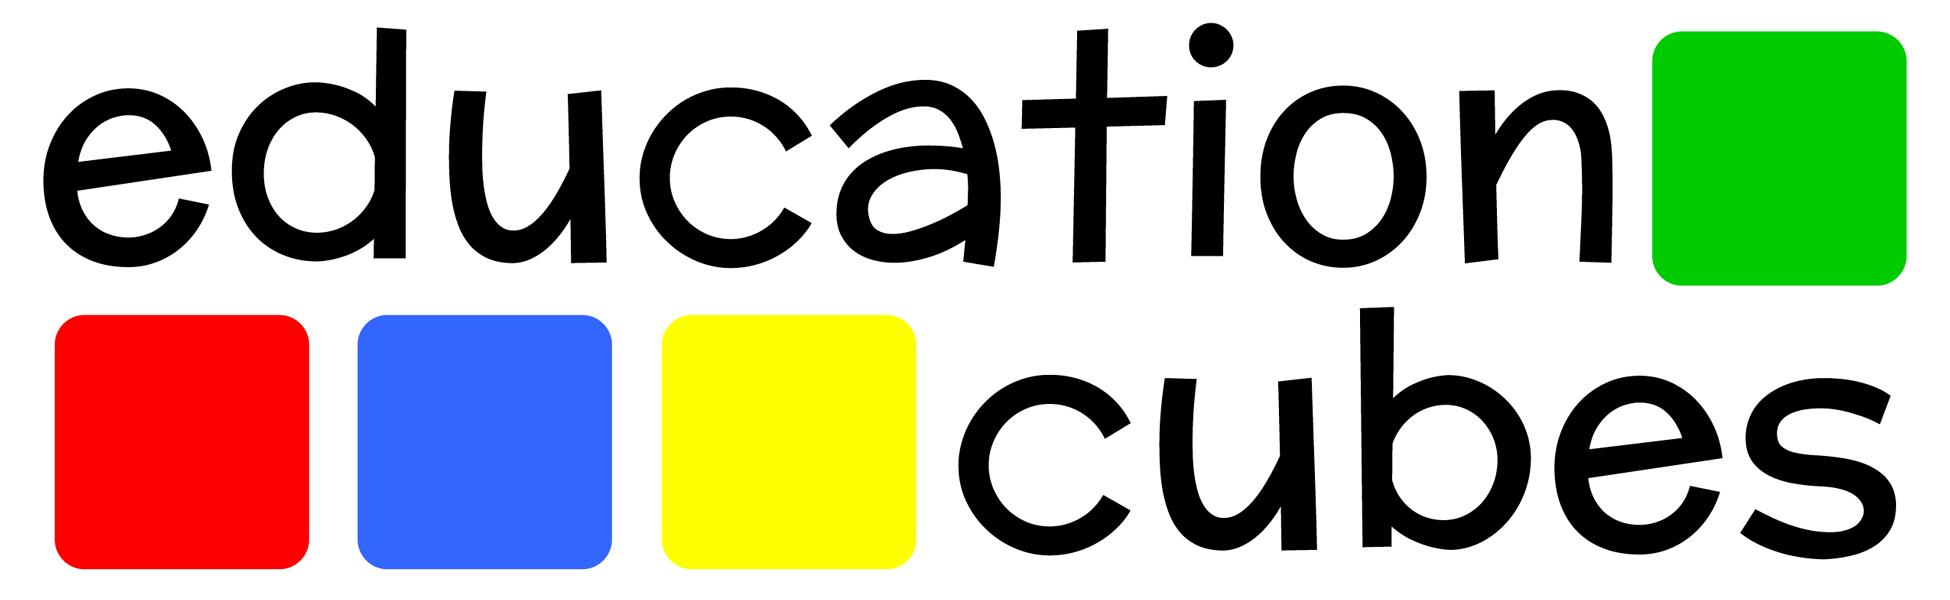 Education Cubes Header